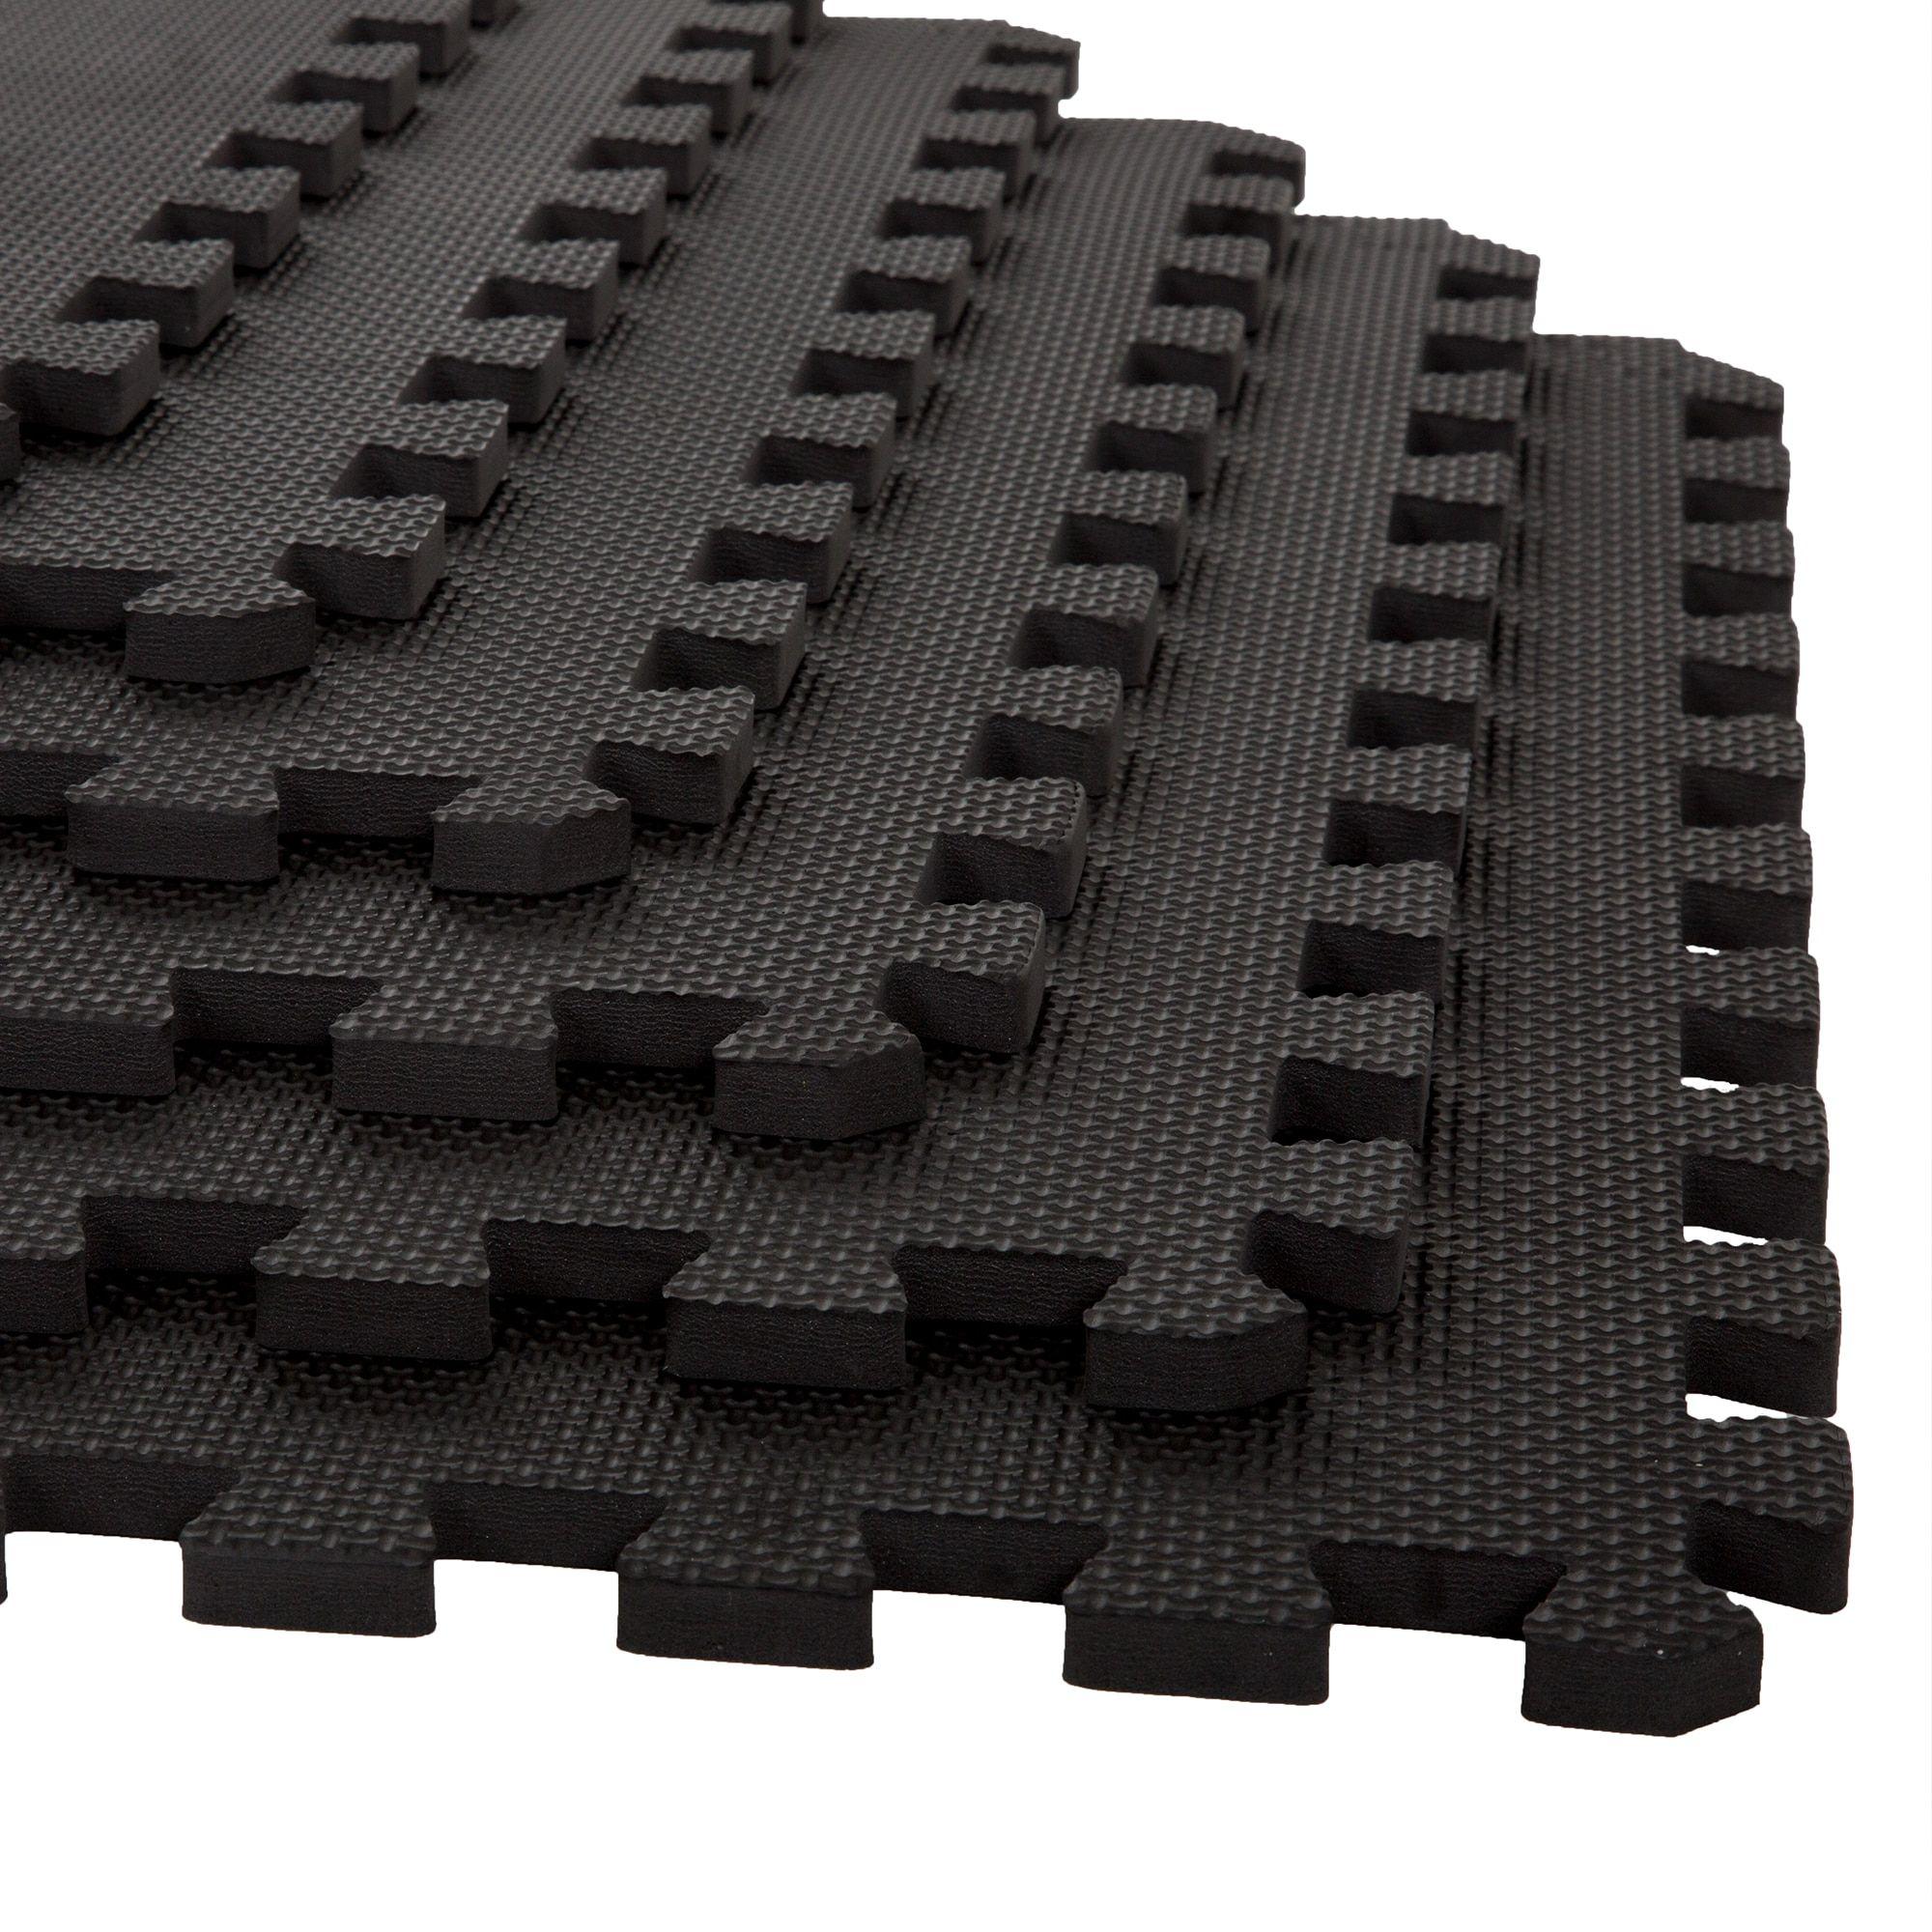 Stalwart interlocking eva foam floor mats interlocking foam floor stalwart interlocking eva foam floor mats interlocking foam floor mats black 24x24x0375 dailygadgetfo Gallery